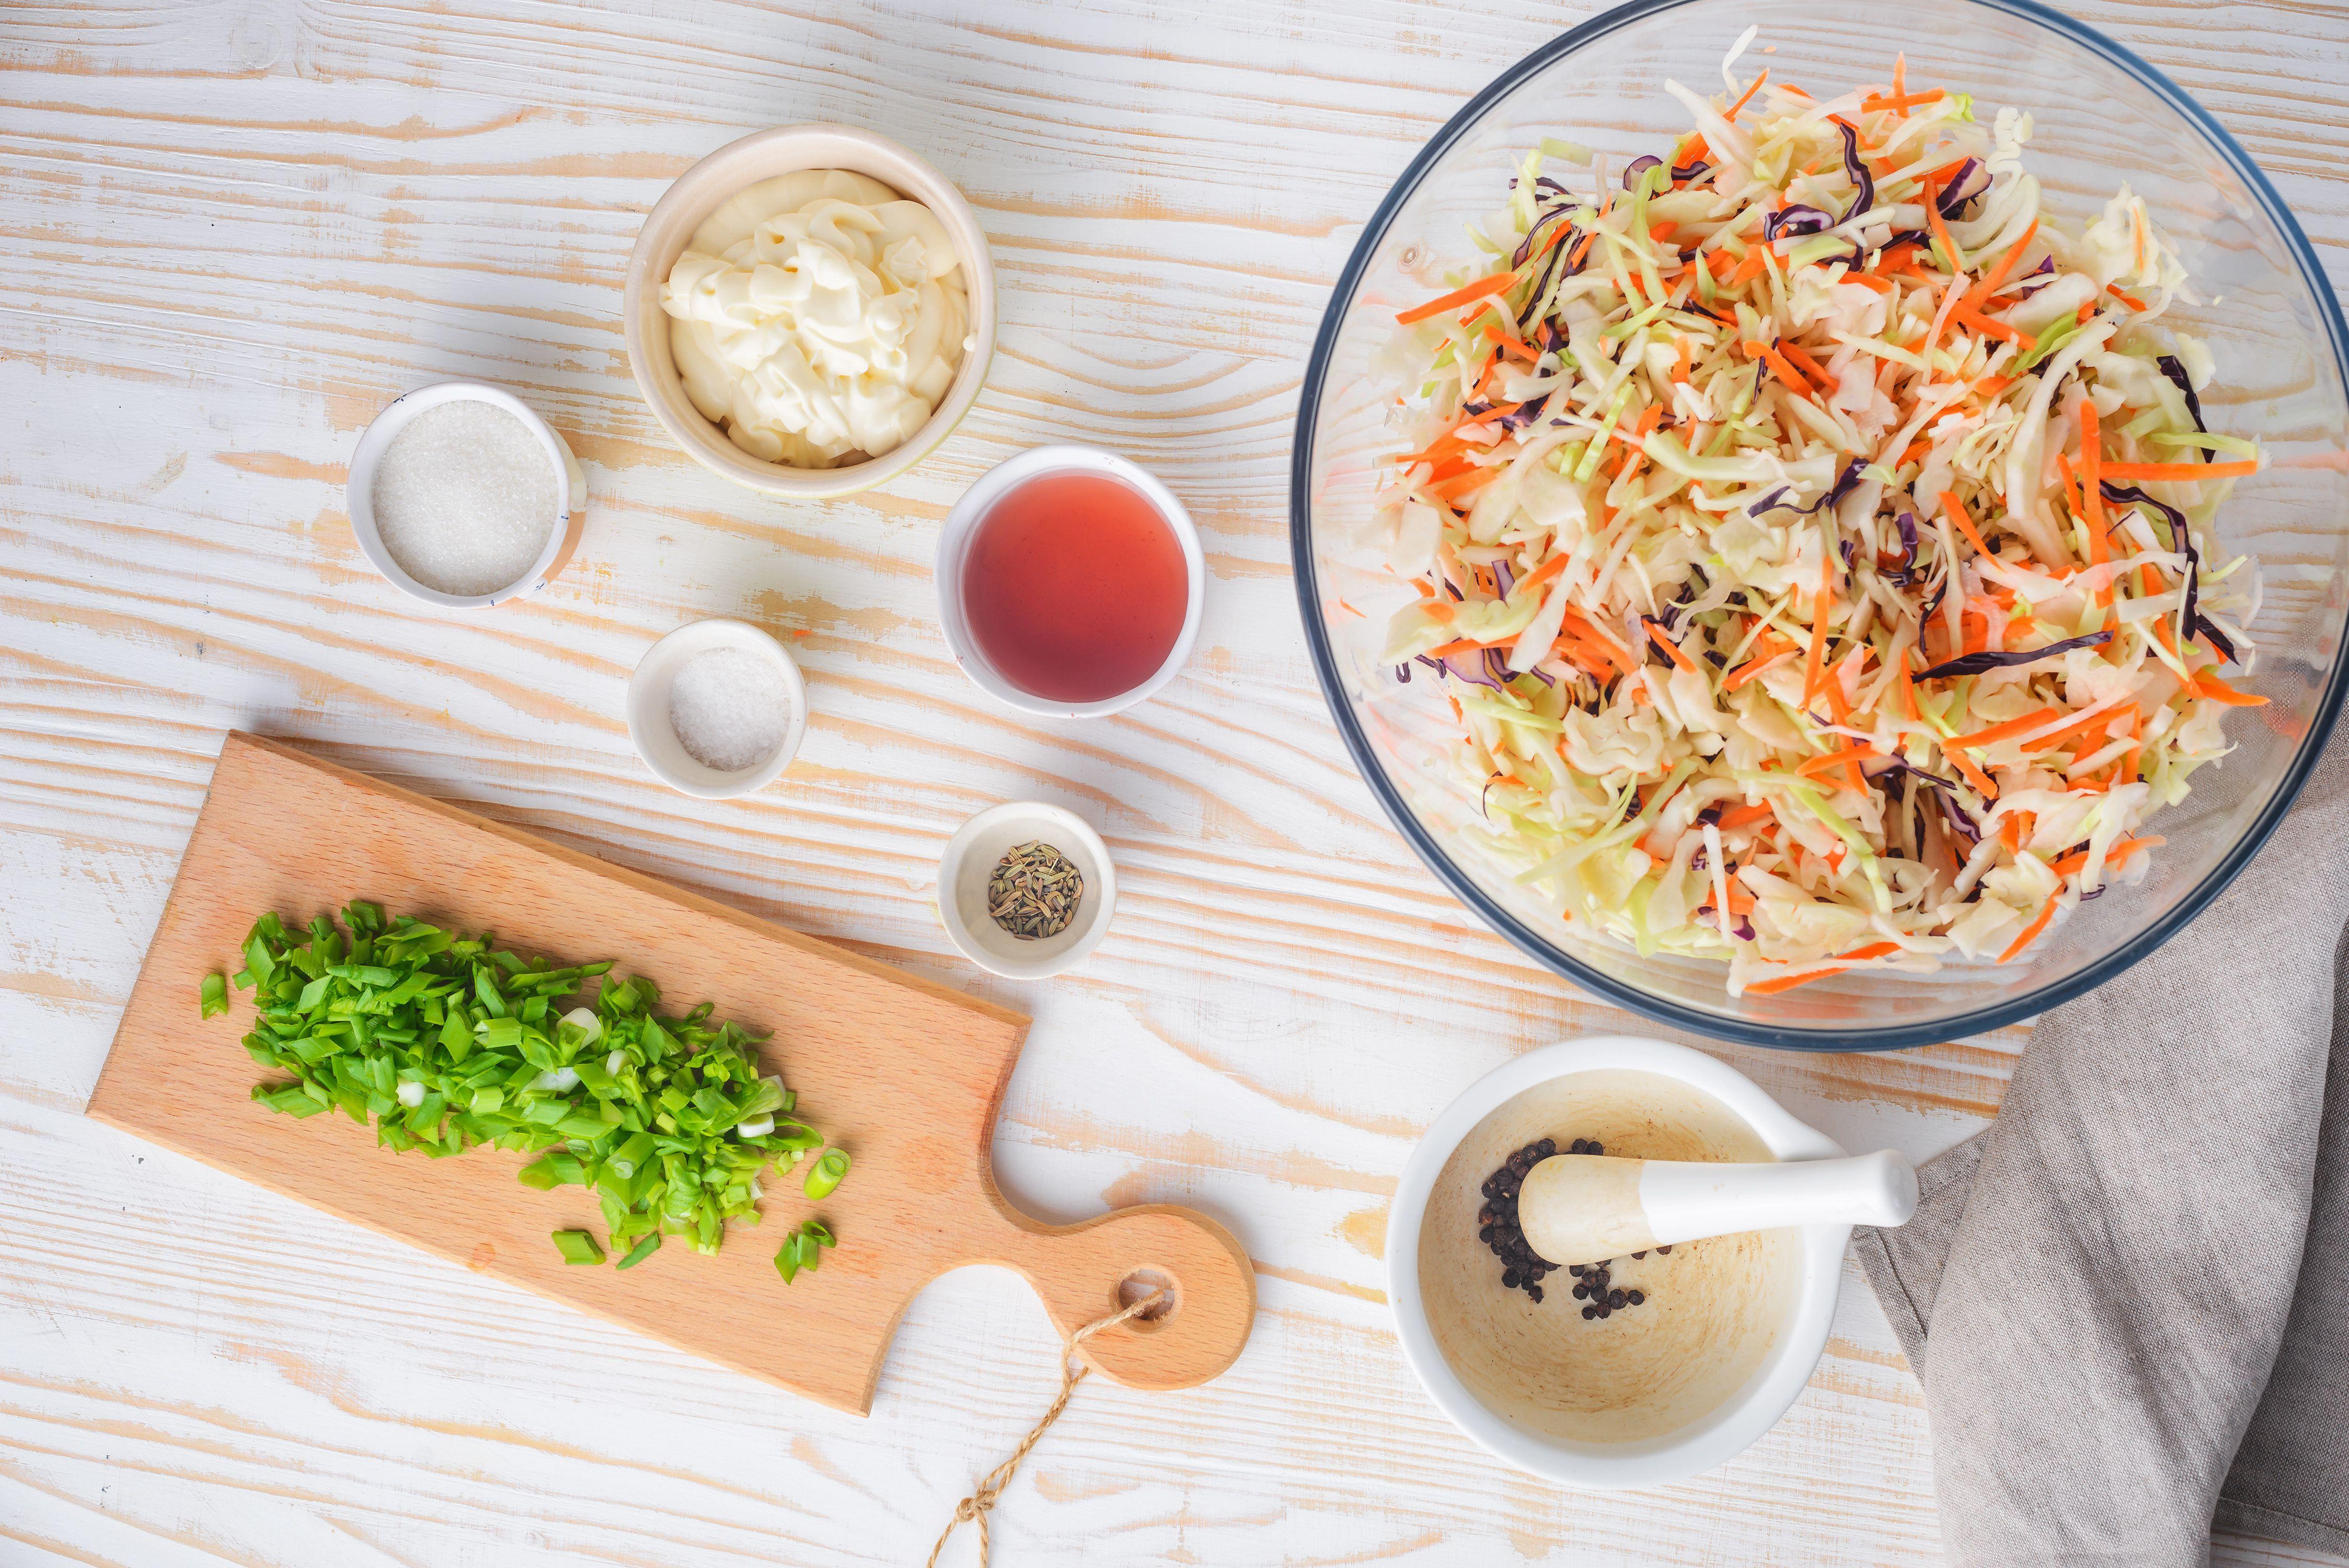 Ingredients for creamy coleslaw